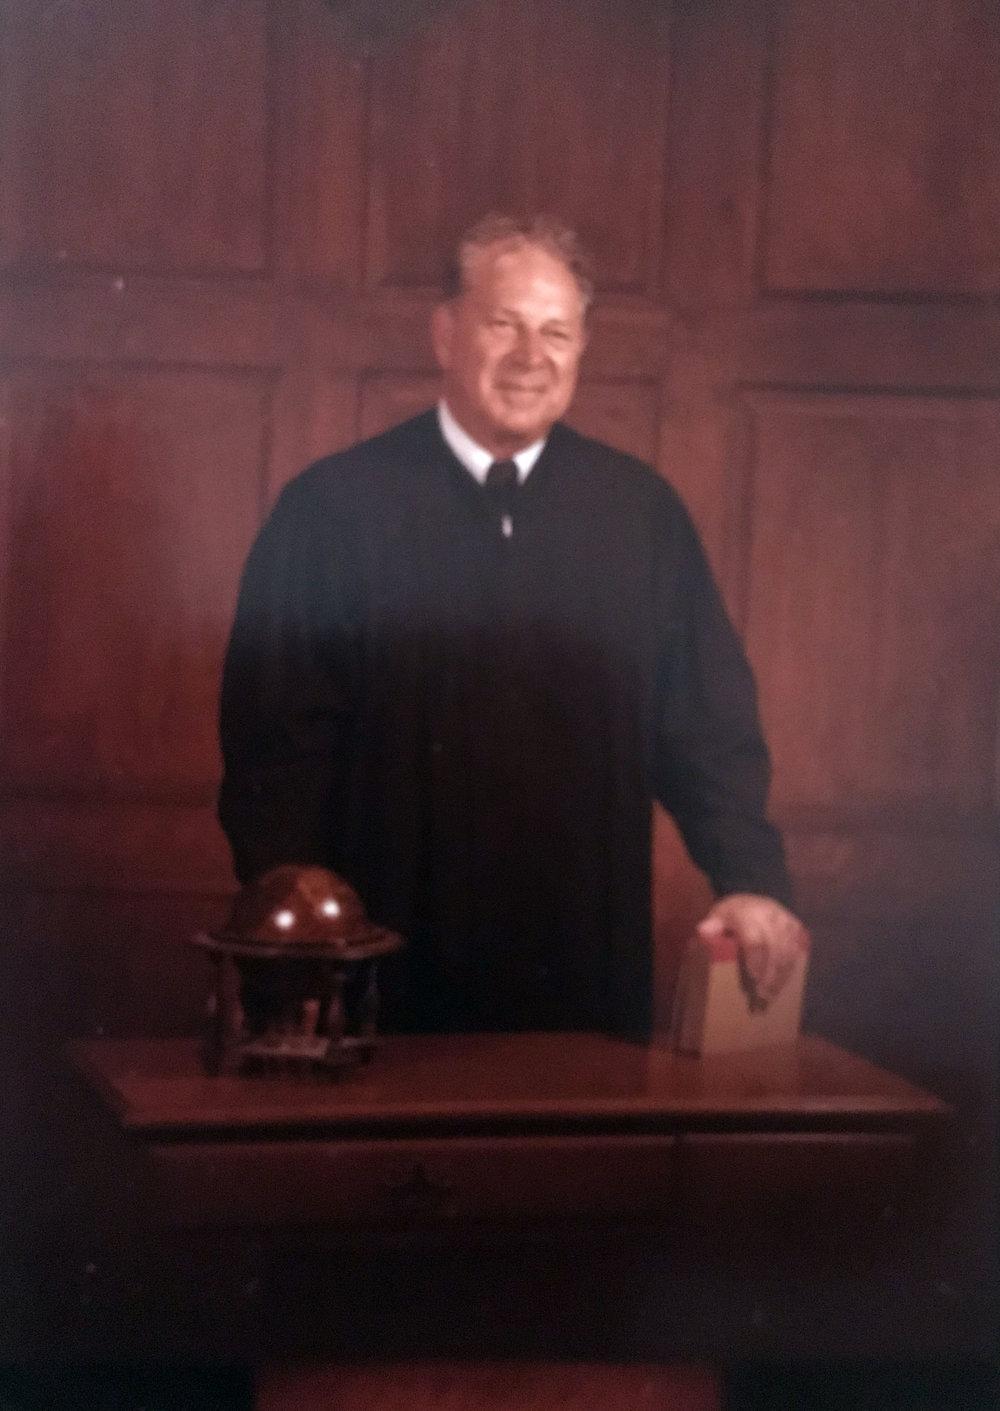 Judge Hamilton Englert, circa 1980 (image copyright, W.L. and D.K. Talbott Trust)